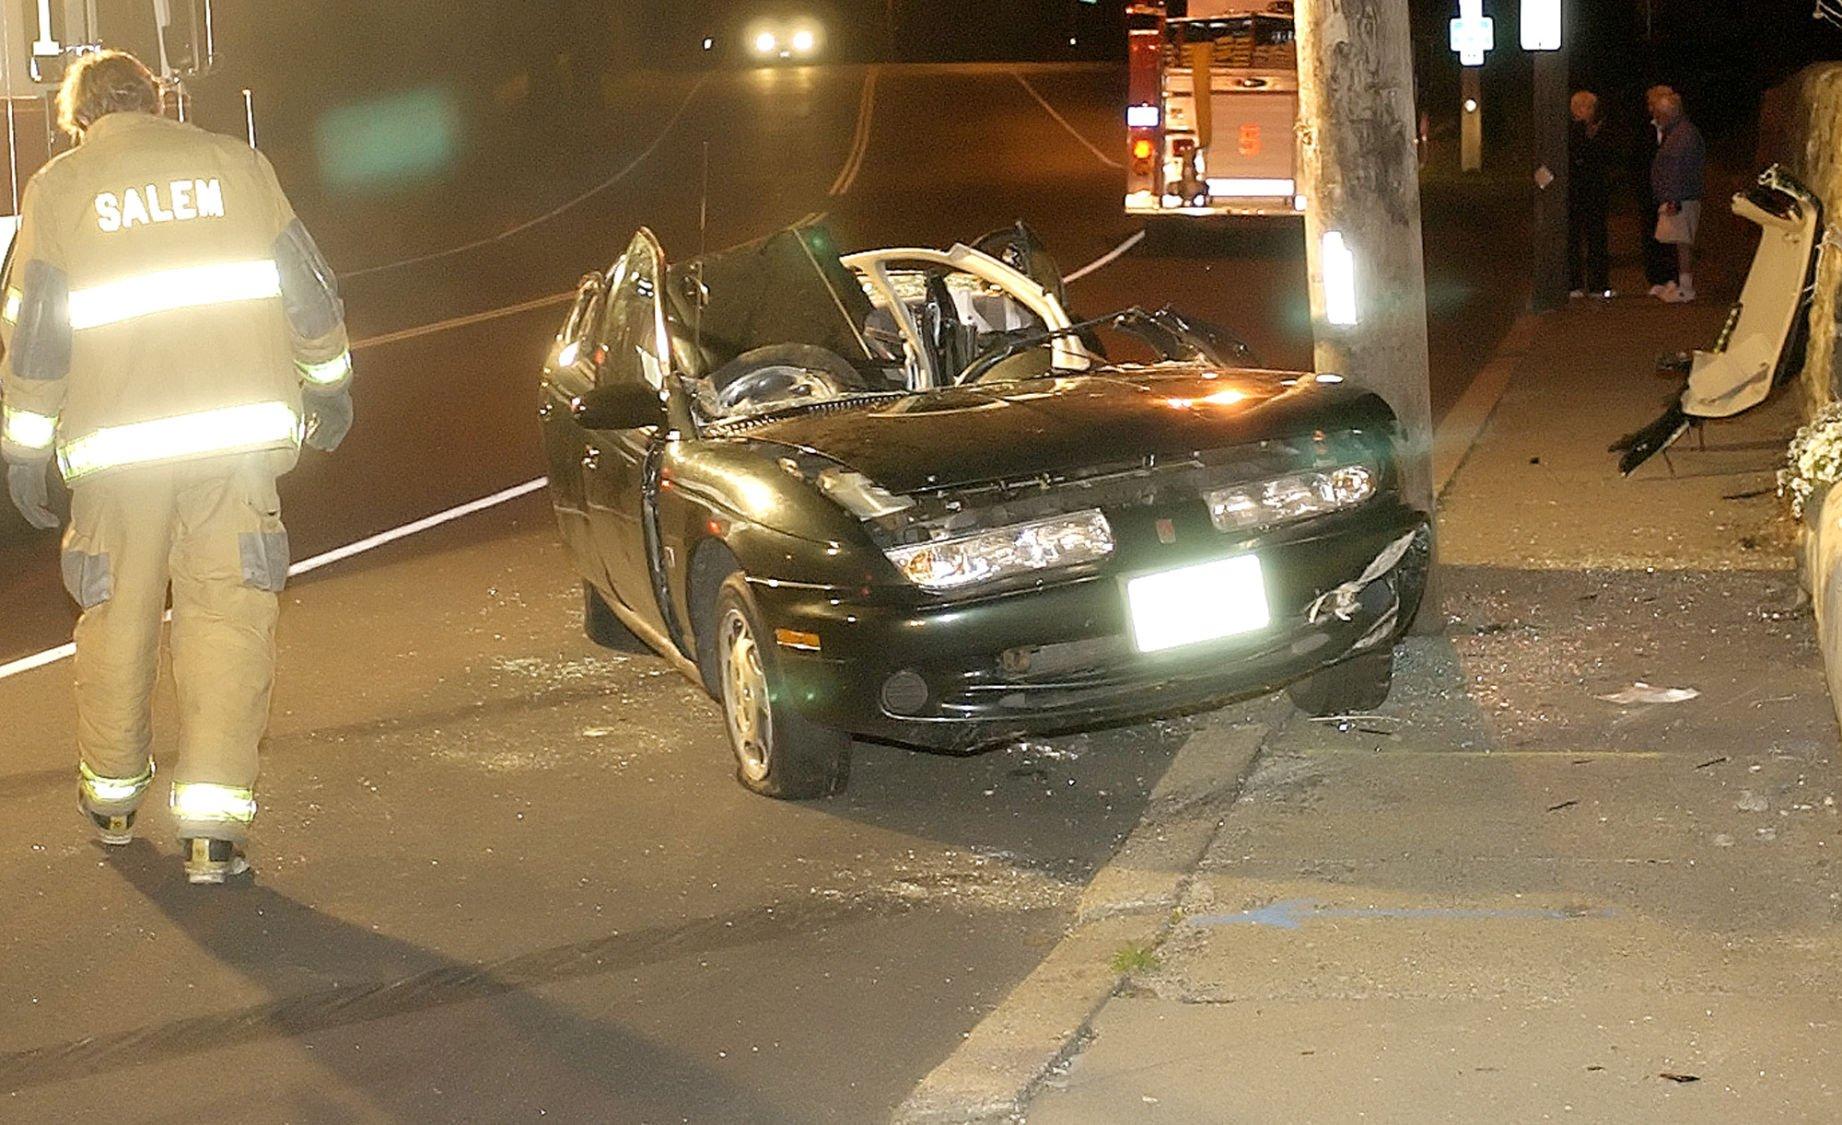 salem teen seriously injured in car accident archives salemnews com rh salemnews com